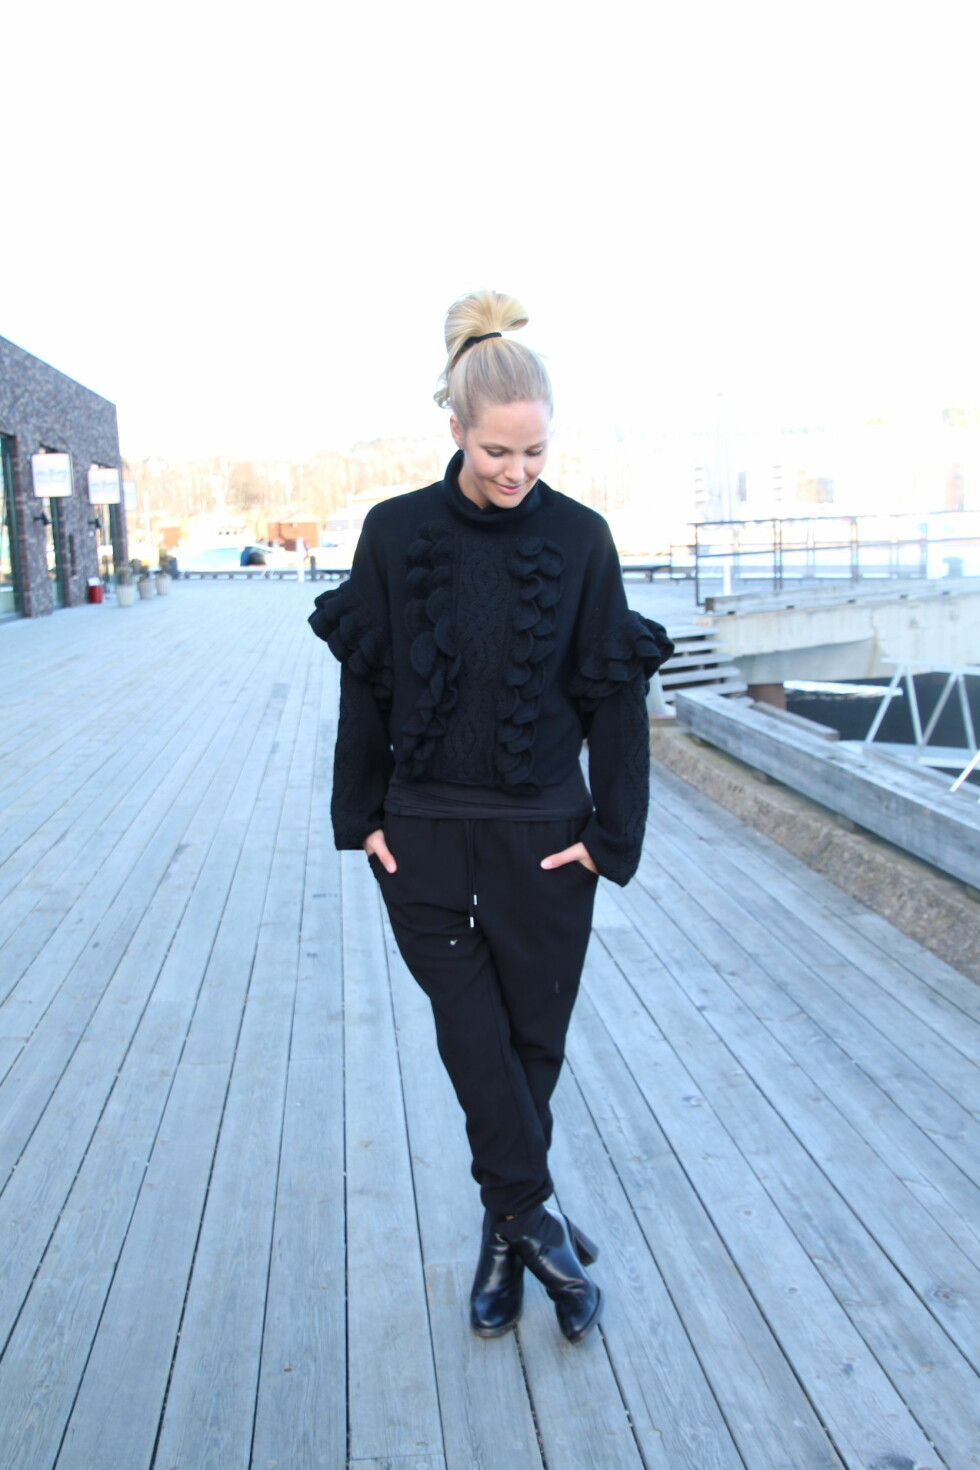 STATEMENT: Marias helsvarte antrekk blir mer interessant med en iøynefallende genser. Foto: Mariaskappel.no